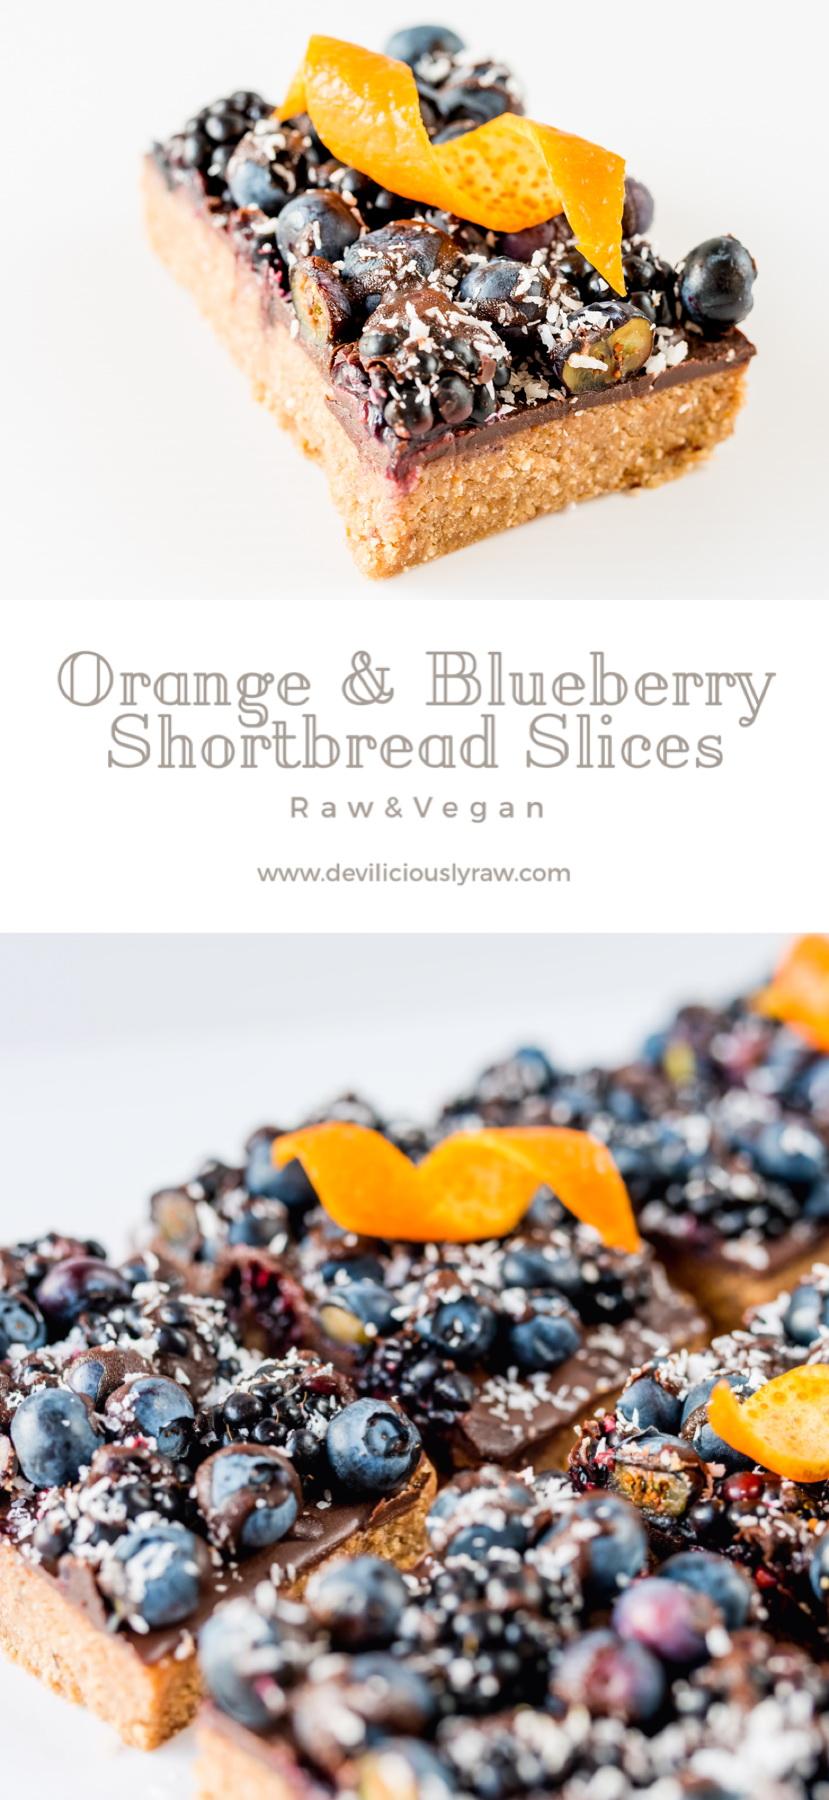 Orange and Blueberry Shortbread Slices